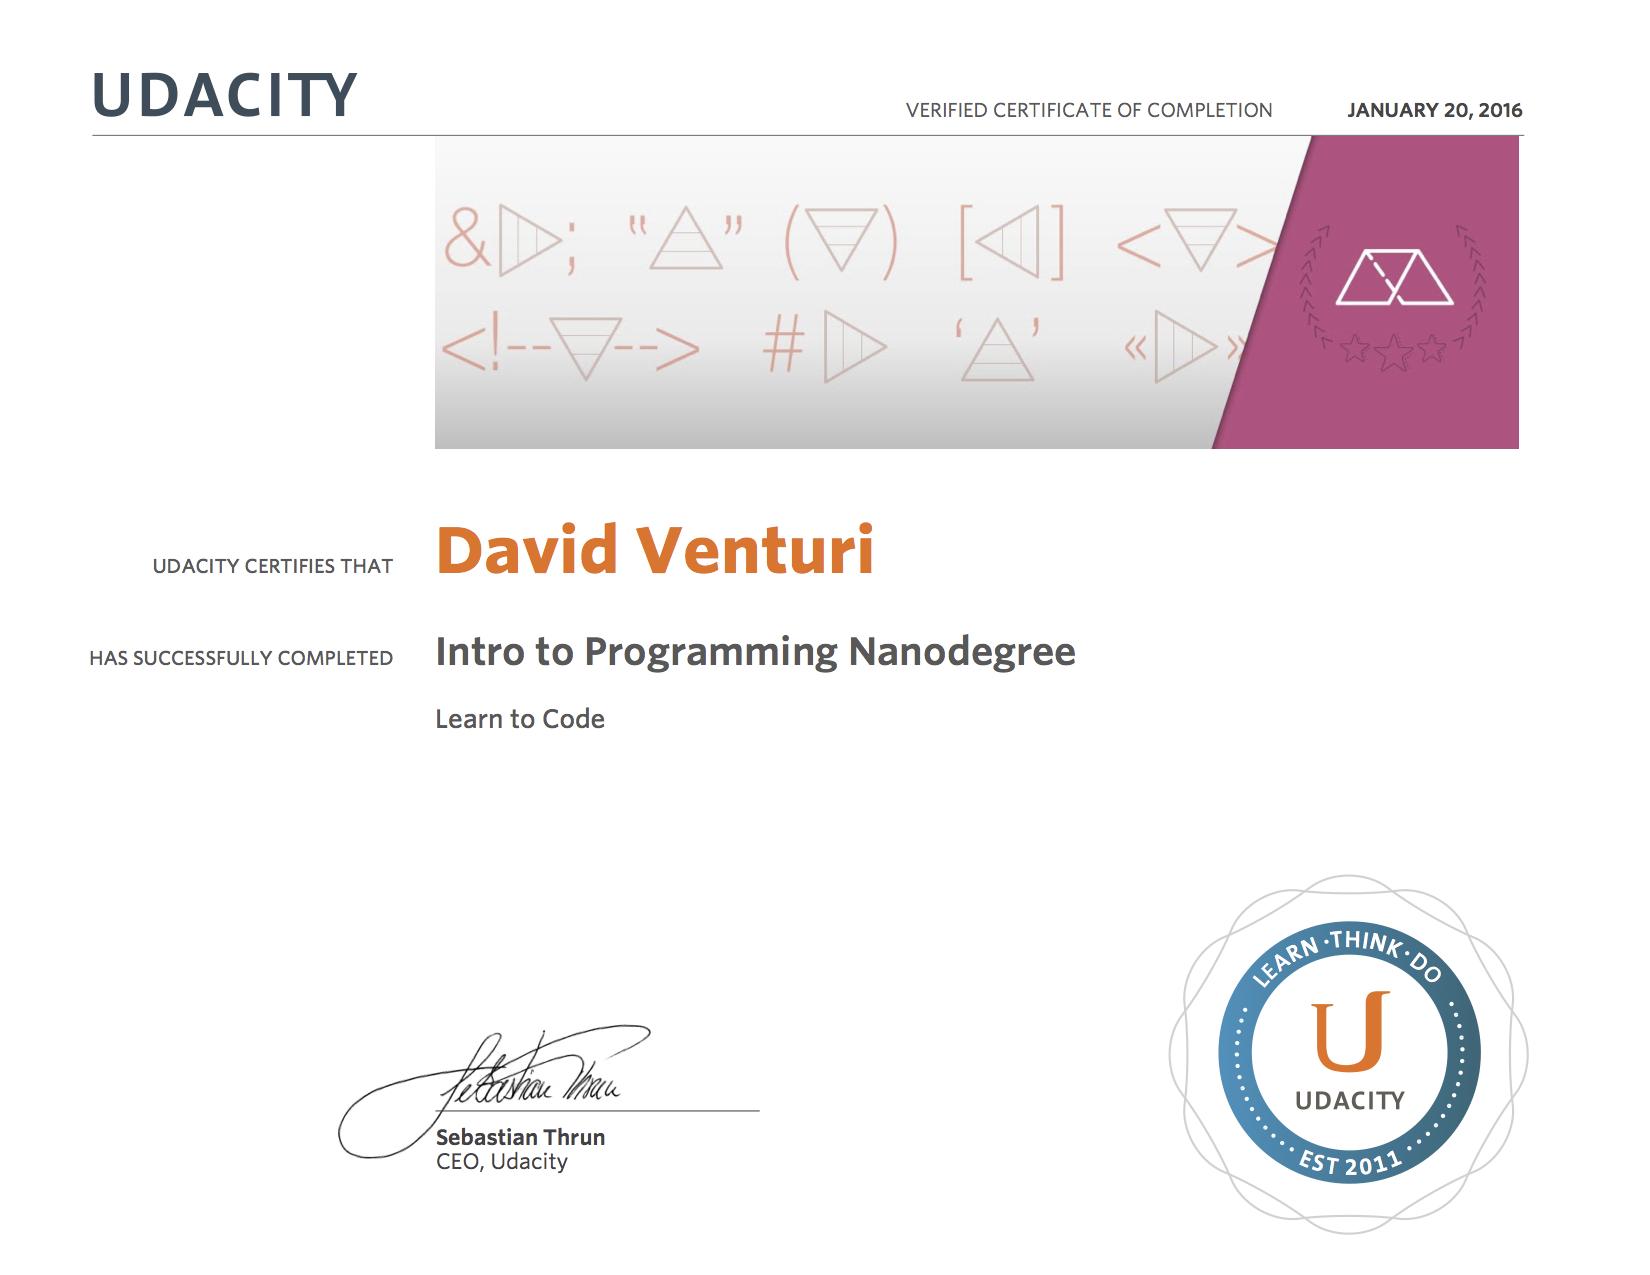 Udacity Intro to Programming Nanodegree Certificate